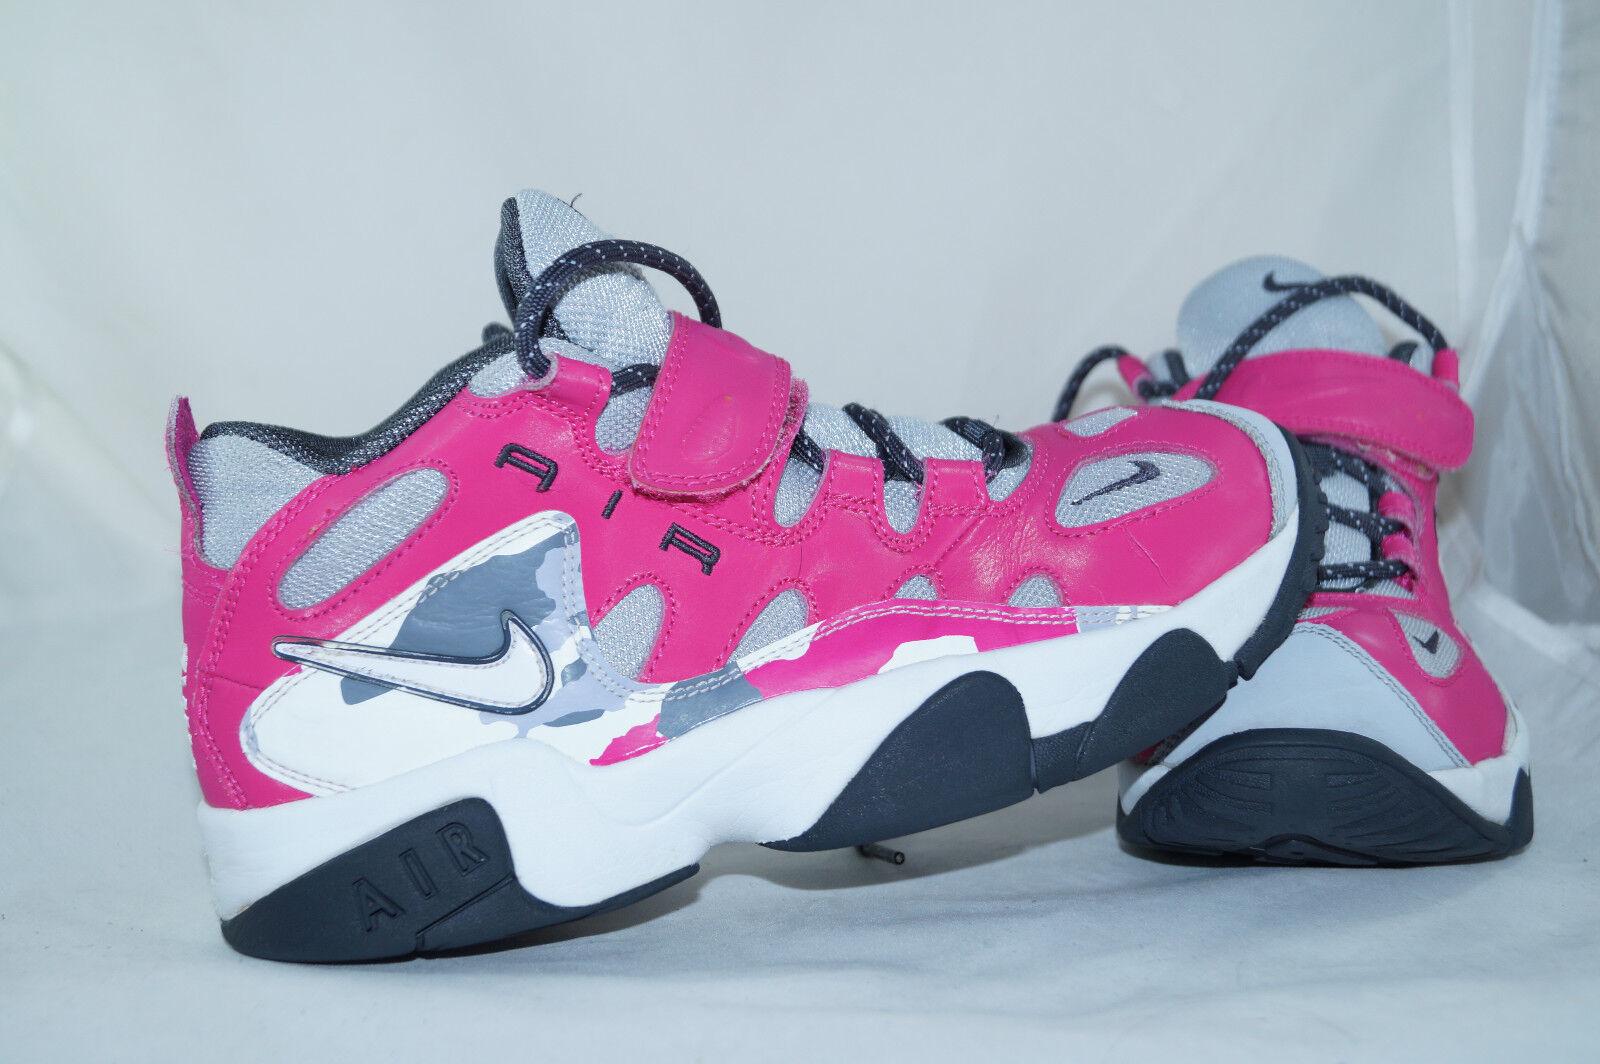 Nike Air Turf Raider (GS) Gr  39 - 38 rose Trainers Chaussures De Sport